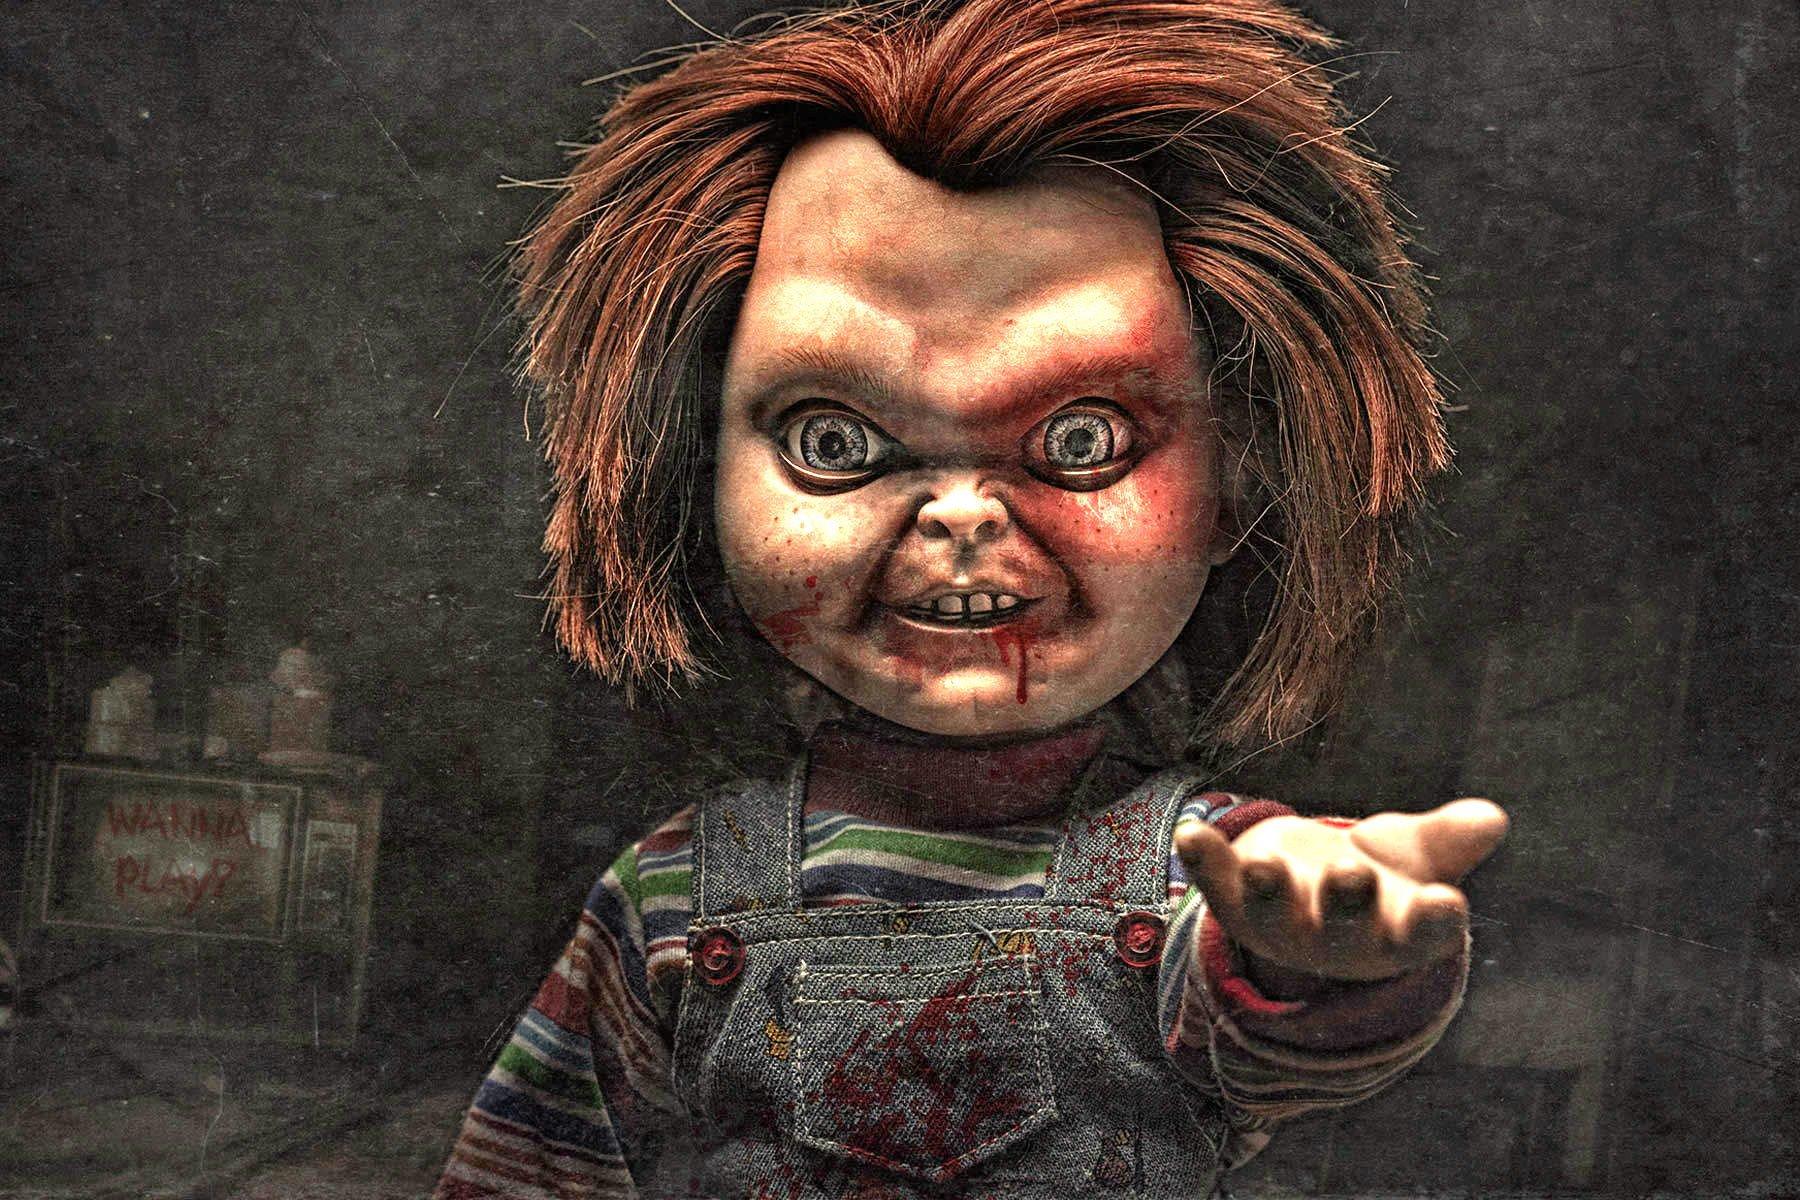 childs play chucky dark horror creepy scary (35) wallpaper